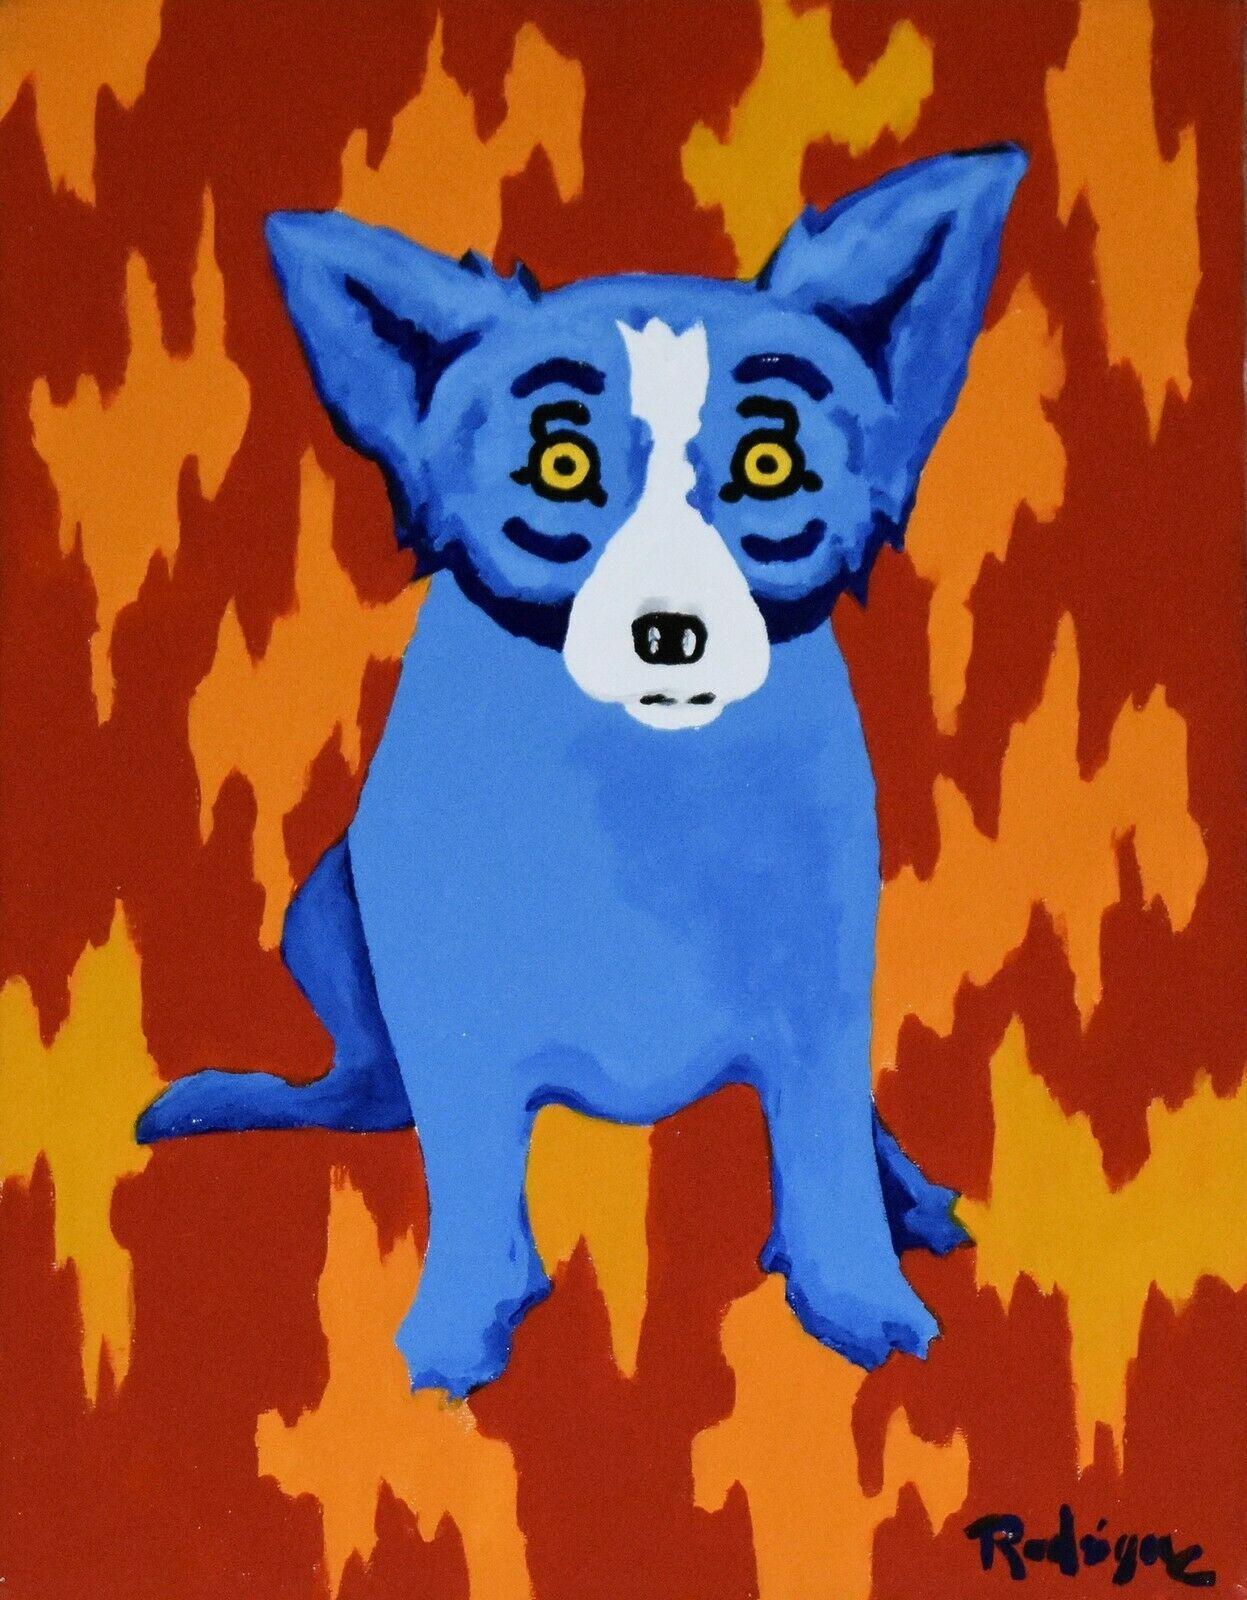 George Rodrigue Blue Dog Signed-Grafik 2003 Wohnkultur Handbemalte HD-Druck-Ölgemälde auf Leinwand-Wand-Kunst-Leinwandbilder 200111